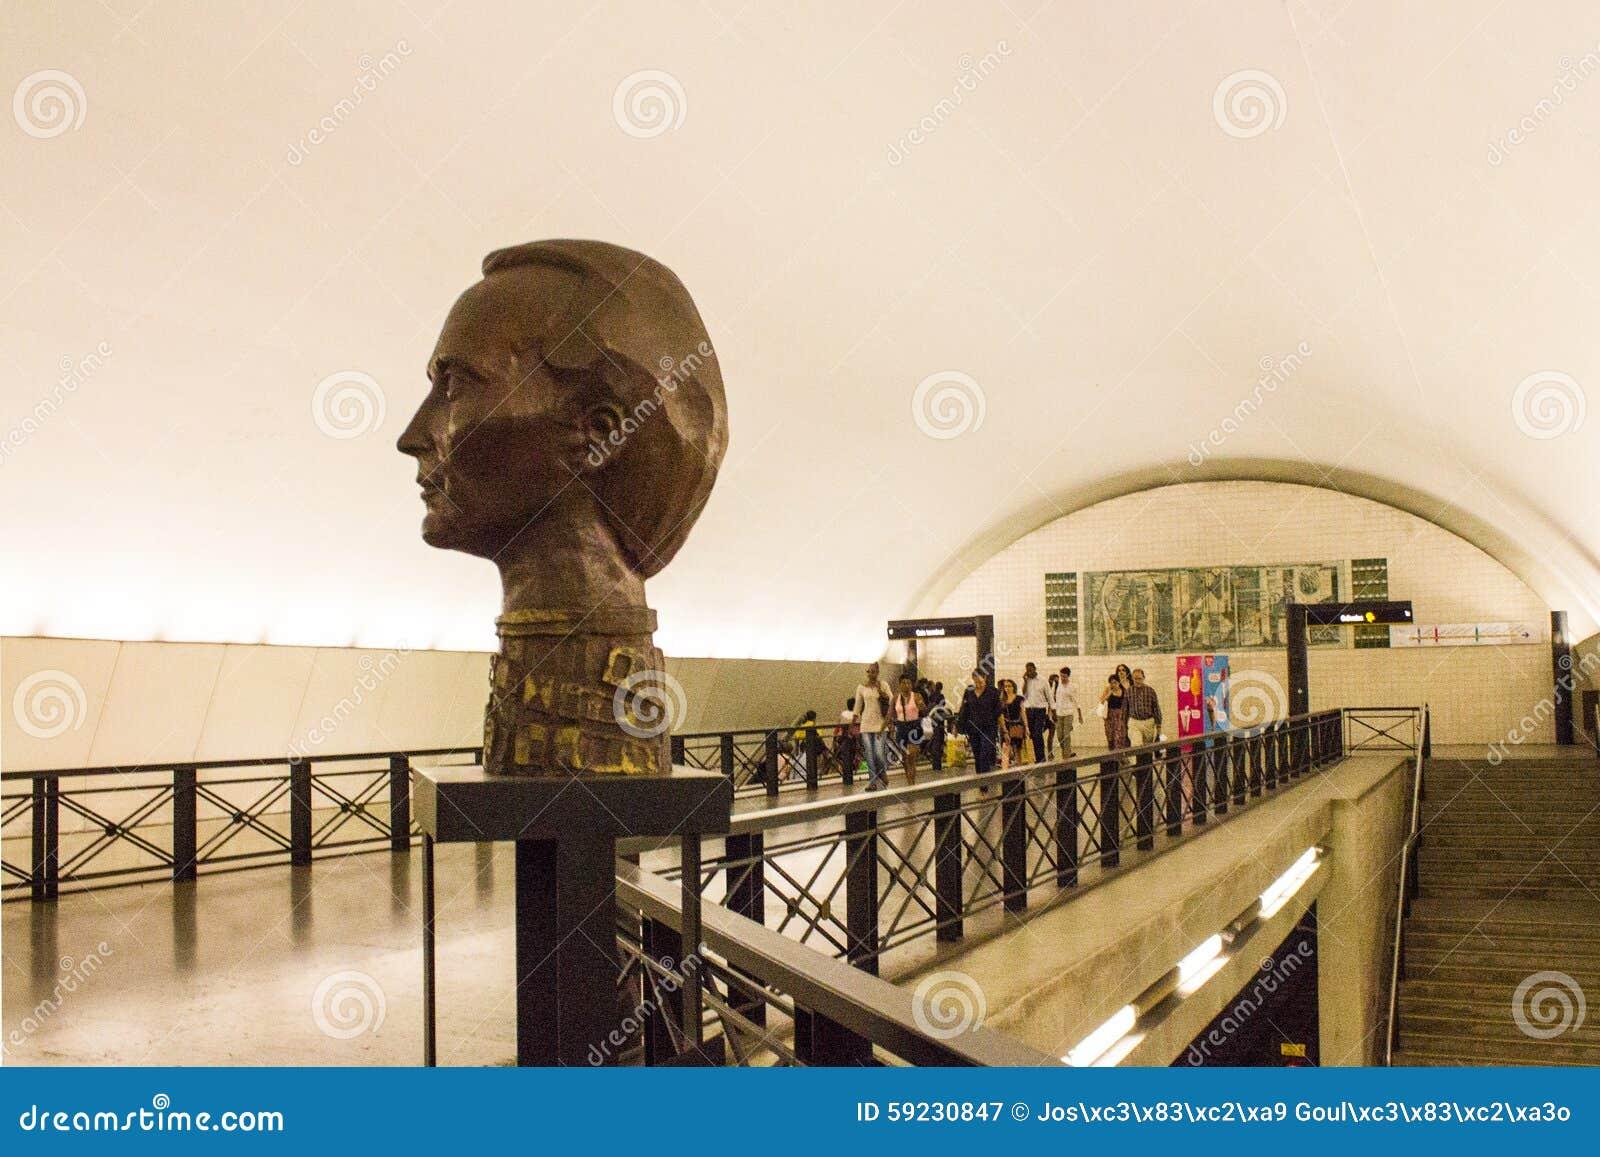 Bust of famous plastic artist Vieira da Silva in Rato subway station in Lisboa, Portugal